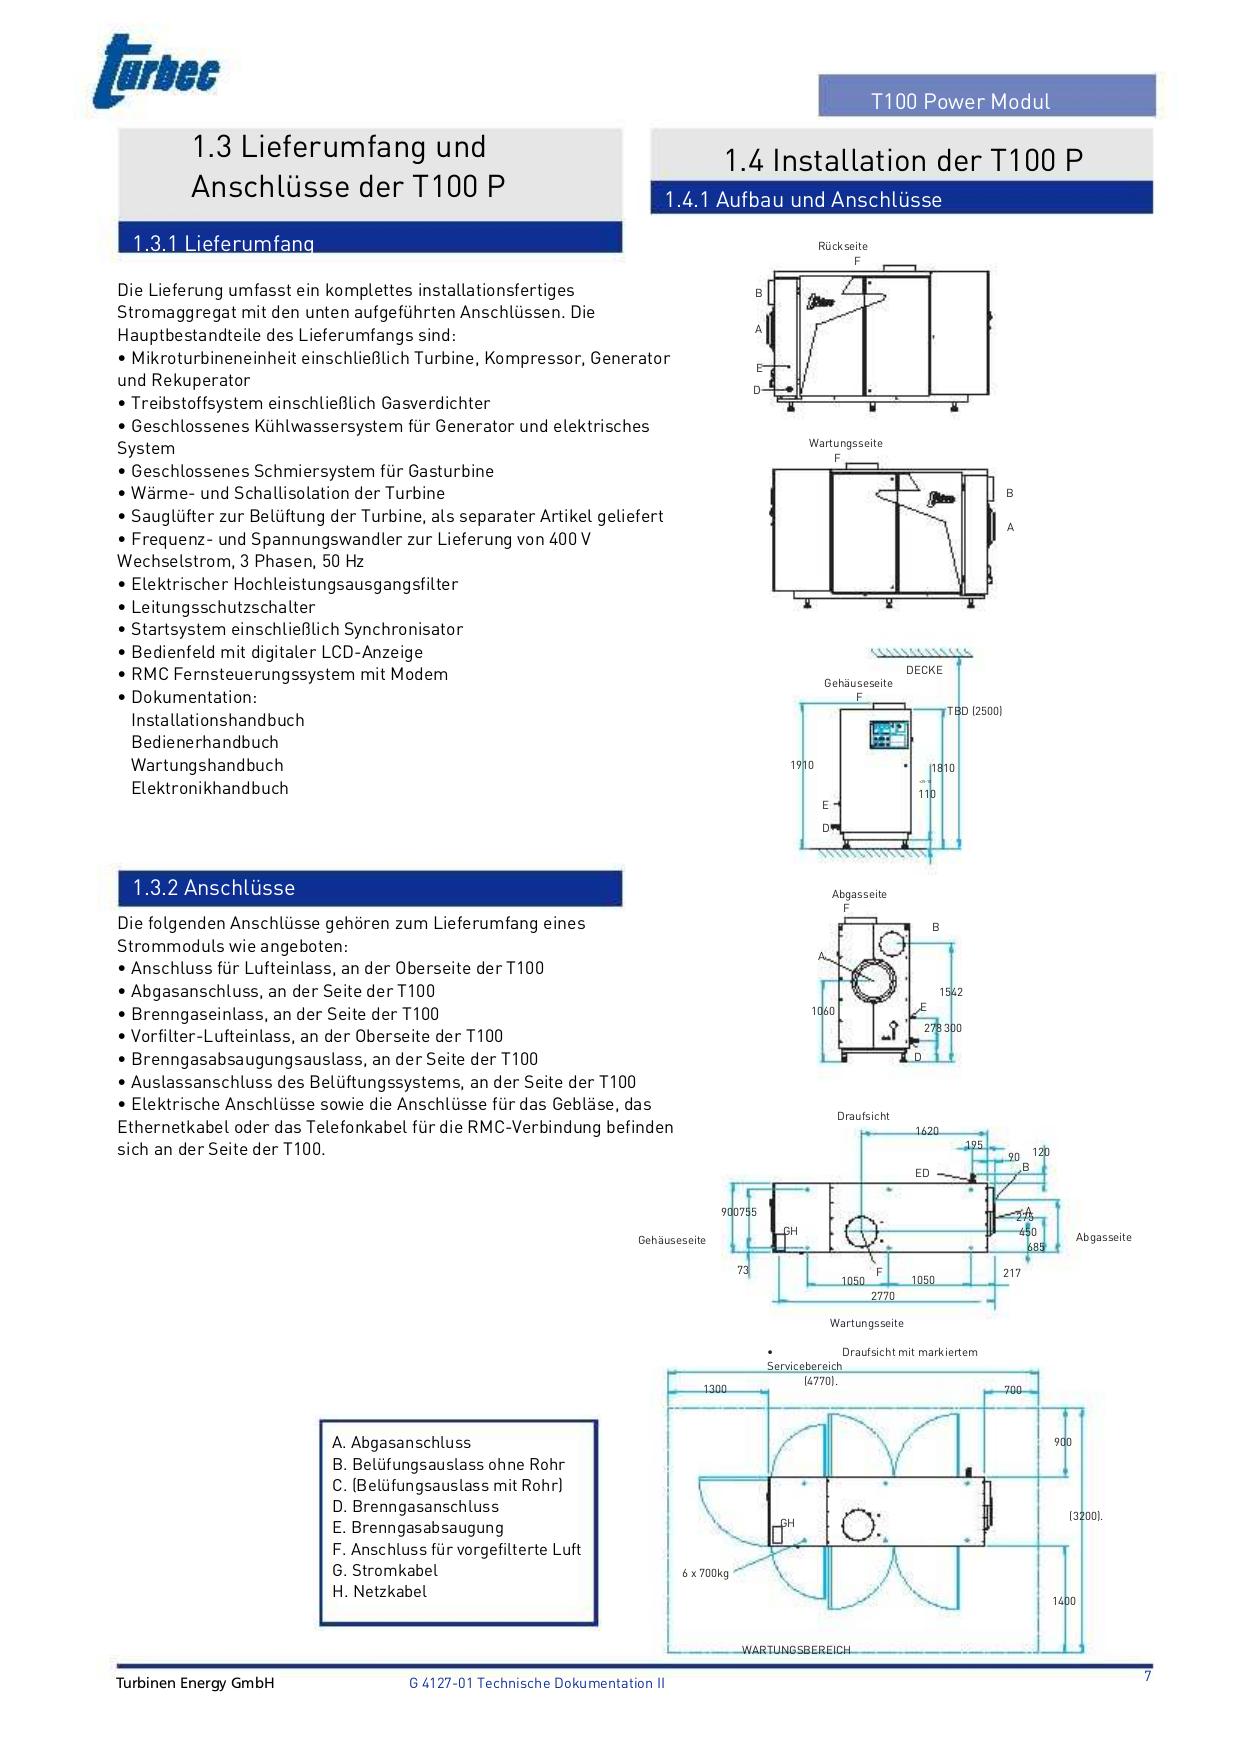 Fantastisch Hausverkabelung Pdf Galerie - Schaltplan Serie Circuit ...